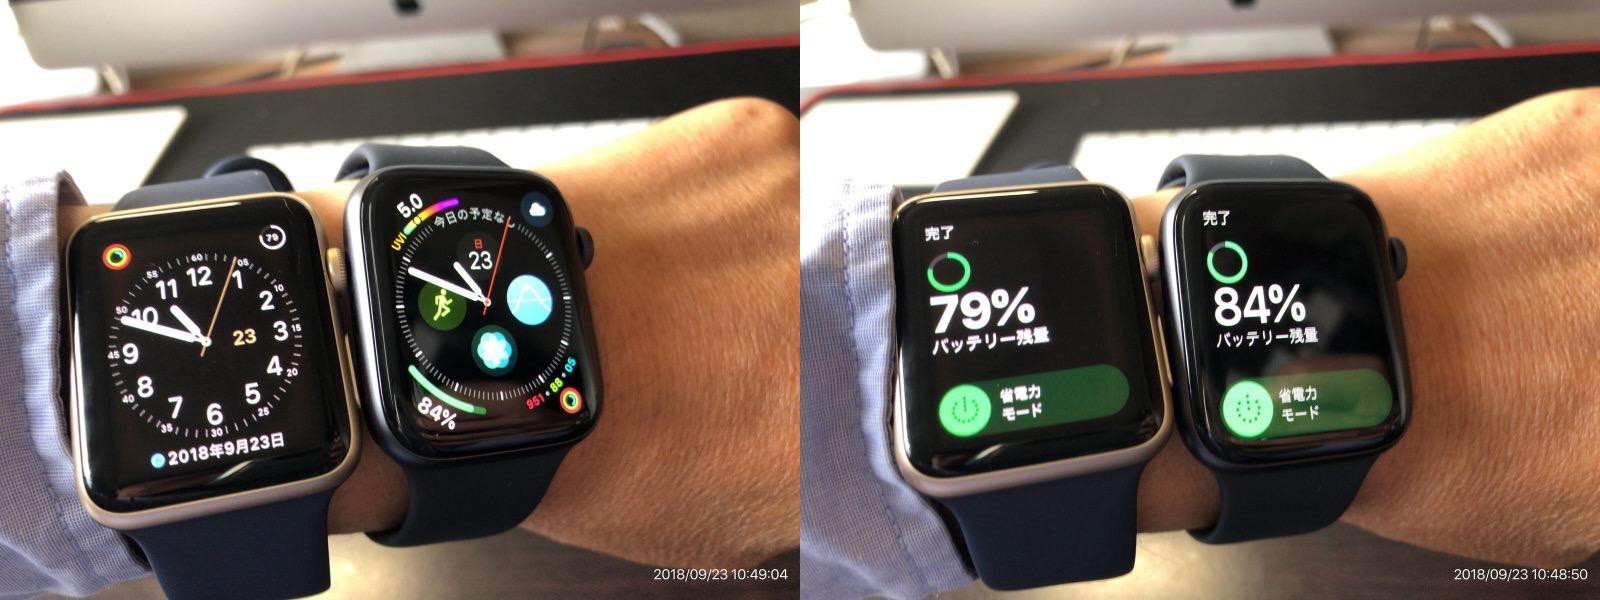 Apple Watch Series 4 -3